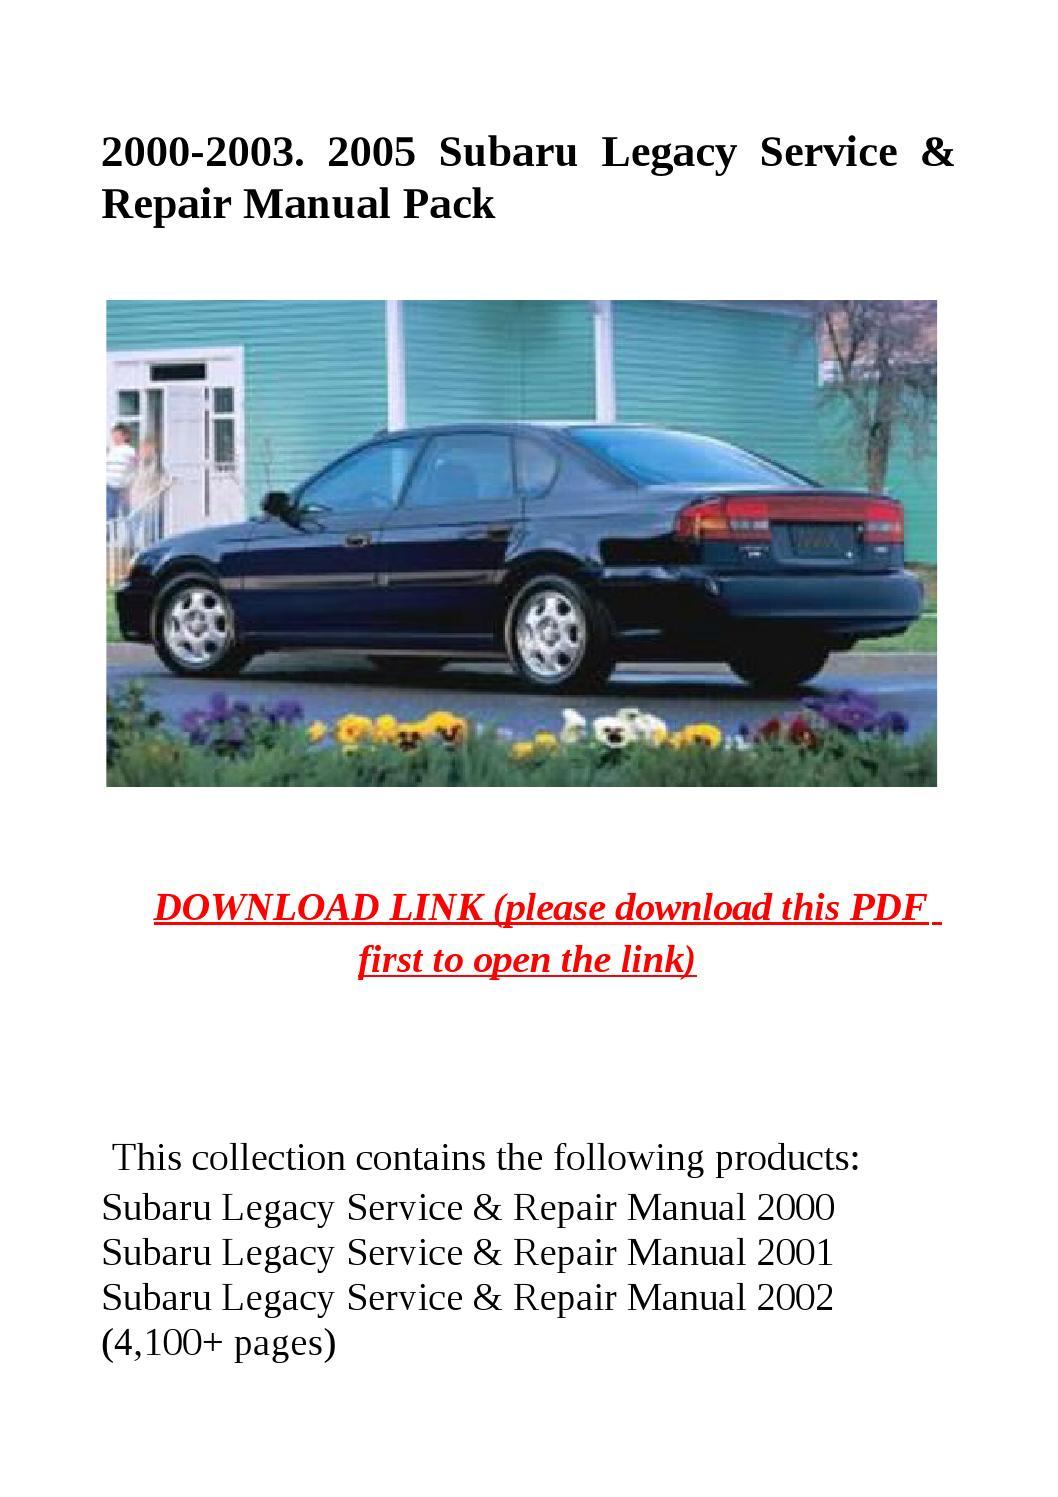 2000 2003 2005 subaru legacy service & repair manual pack by dale - issuu